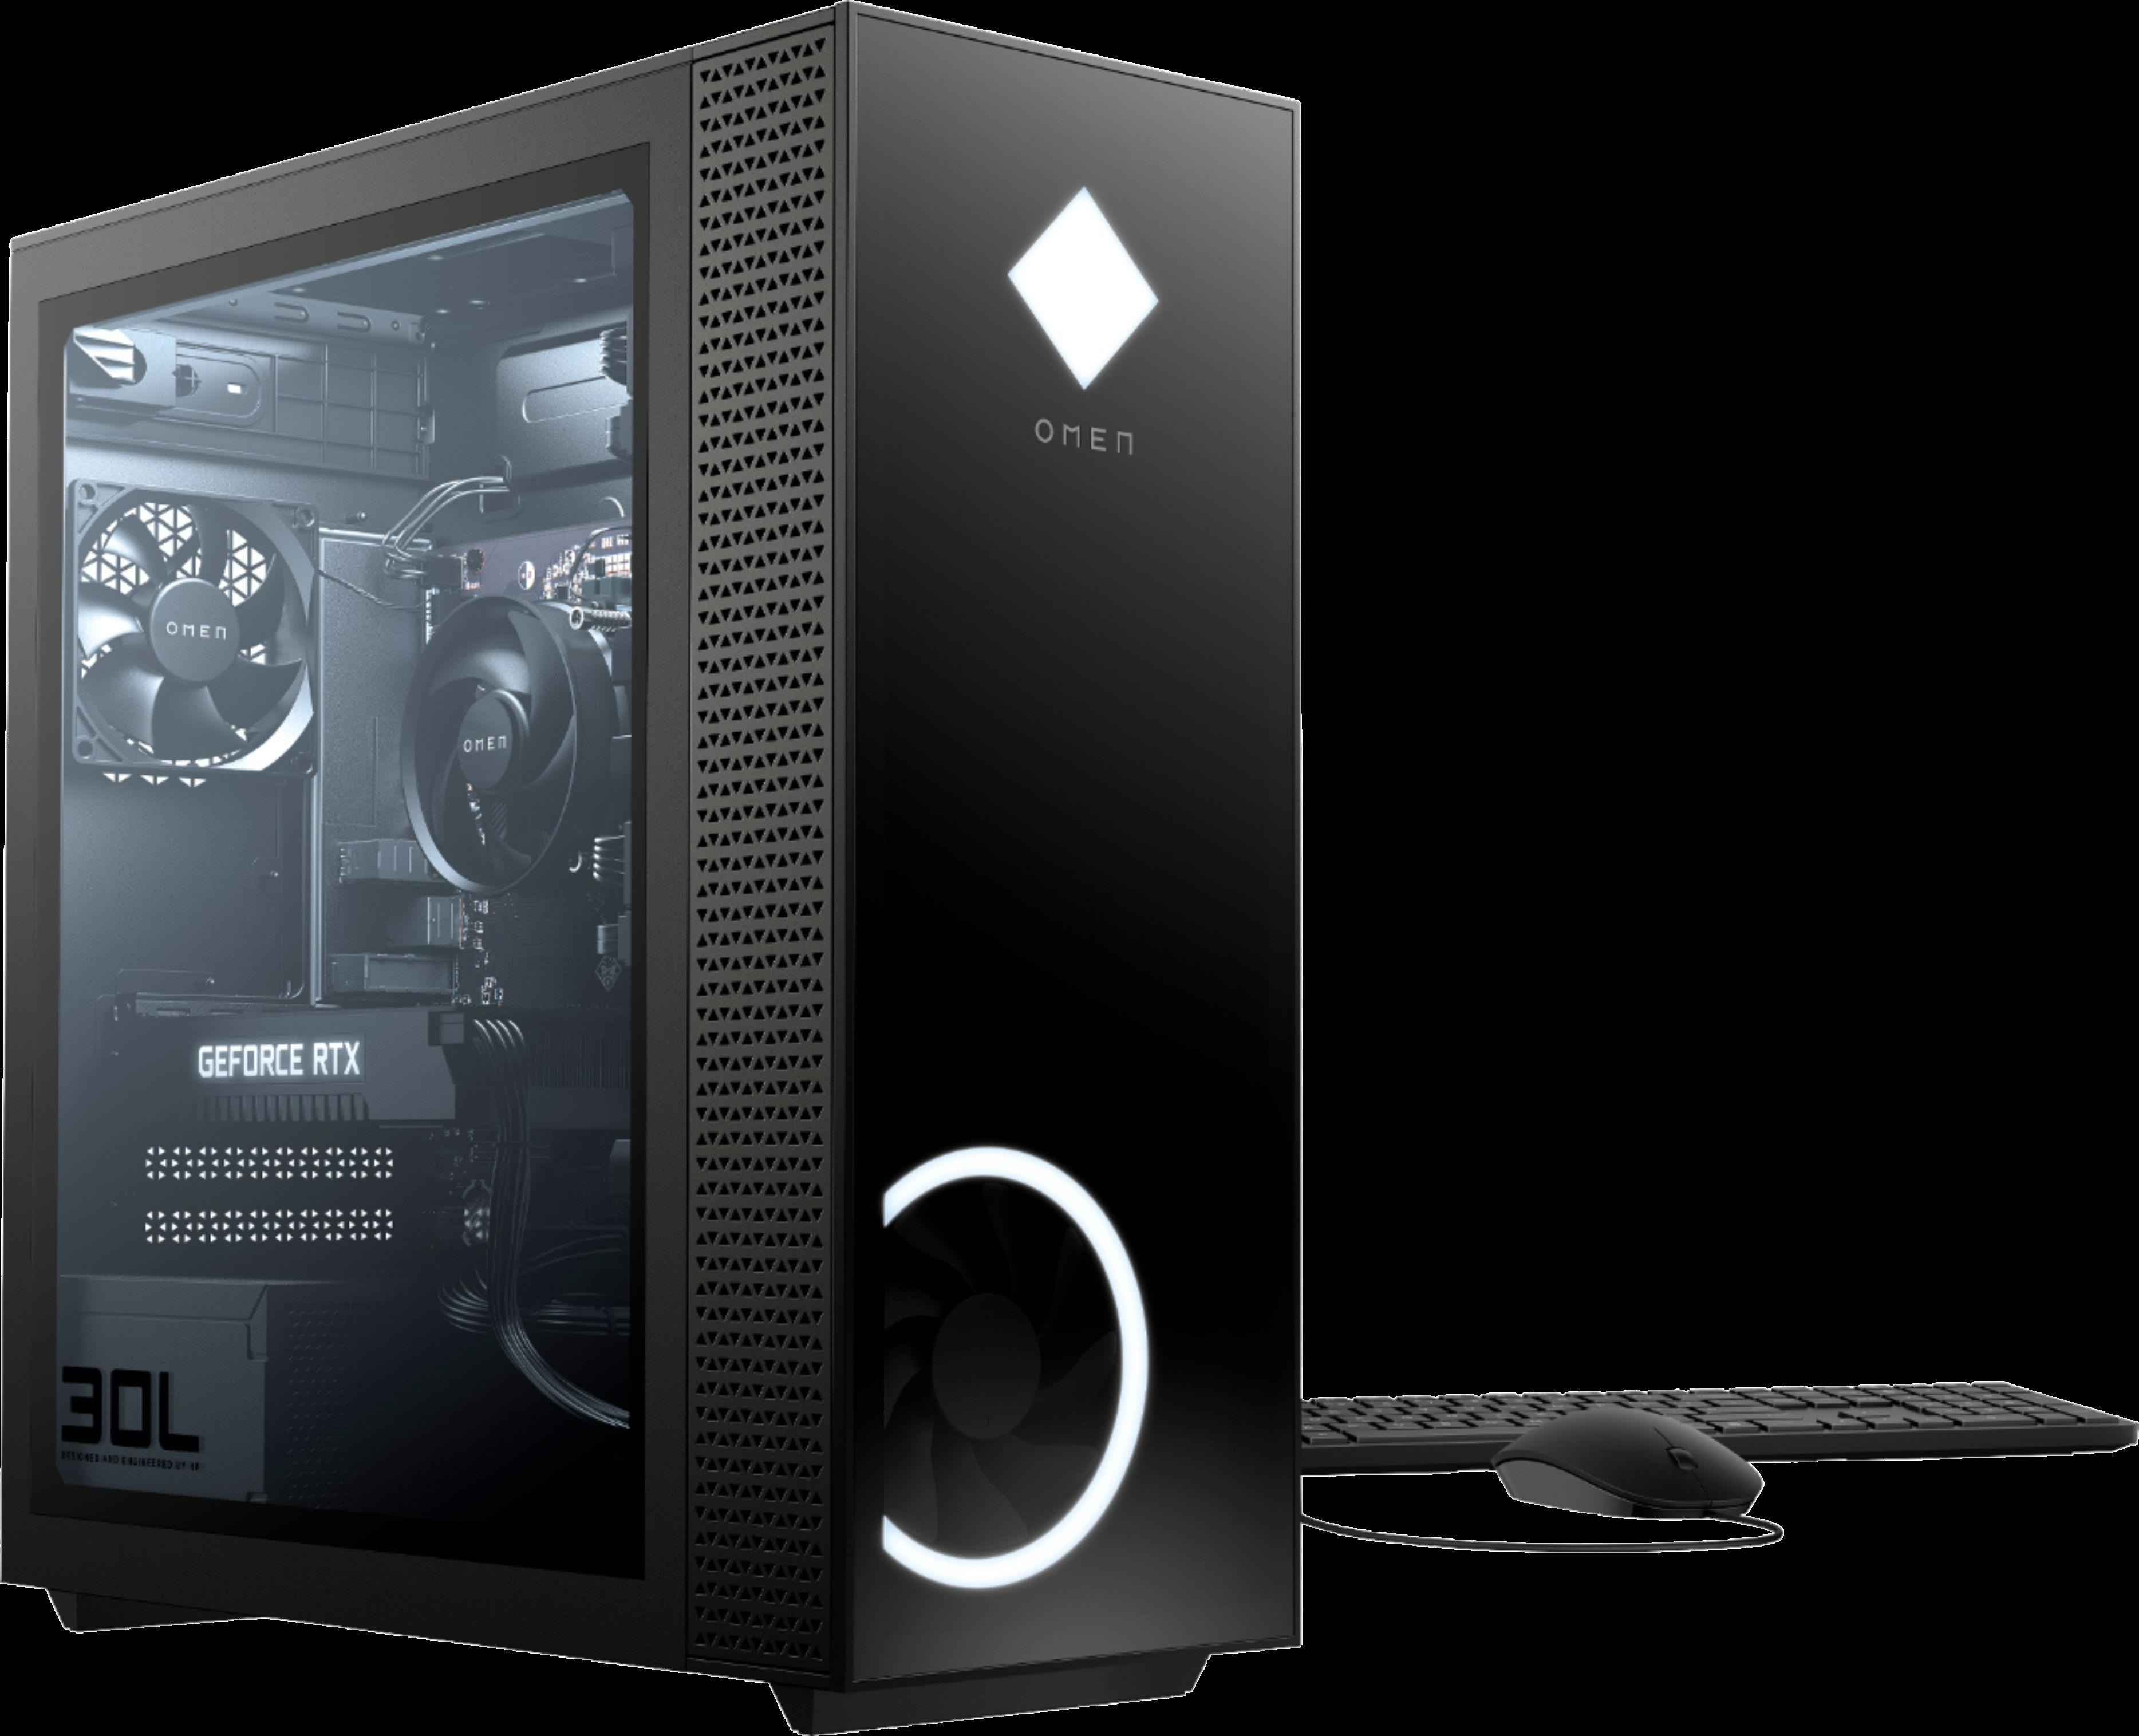 Omen HP OMEN - Gaming Desktop - AMD Ryzen™ 5 5600G - 16GB - 1TB SSD - NVIDIA® GeForce® RTX 3060